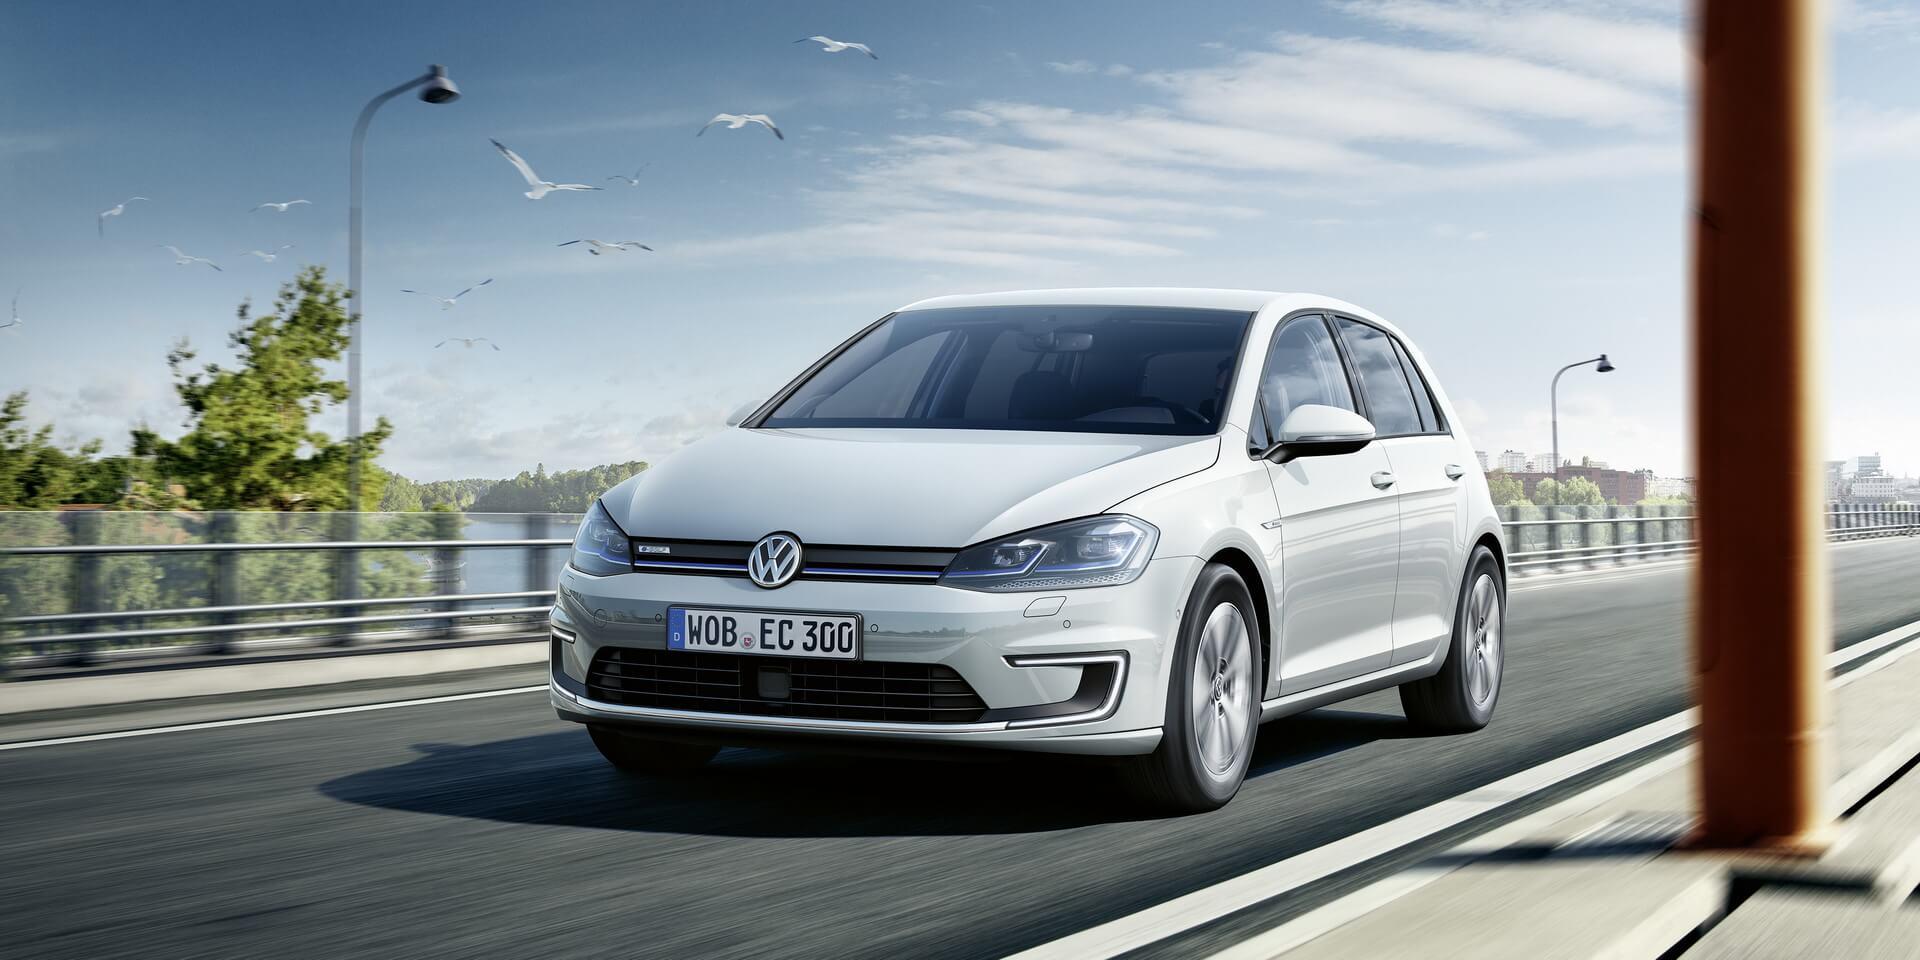 Volkswagen e-Golf — № 5 по продажам за сентябрь в Европе